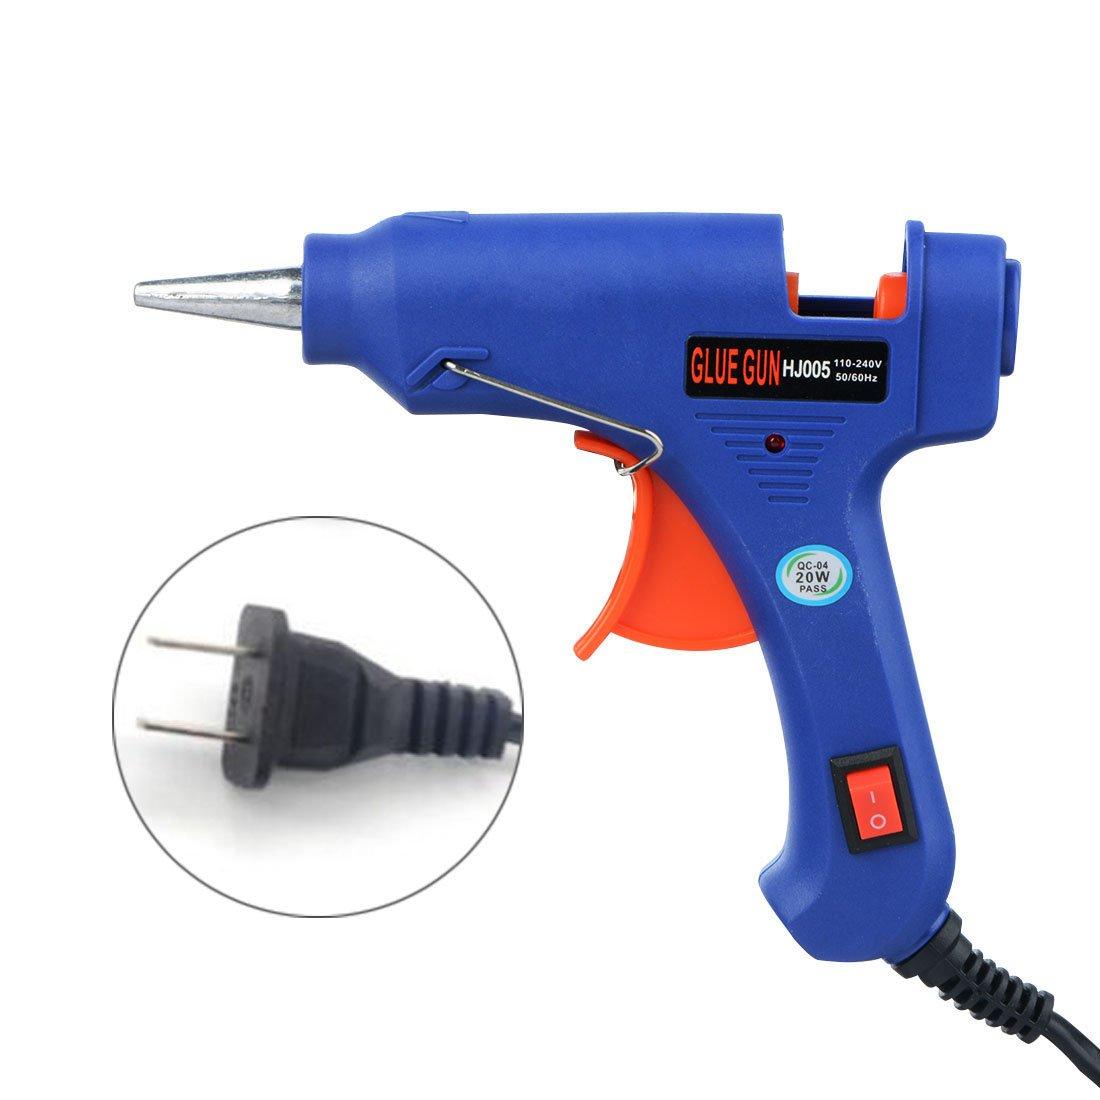 Hot Glue Gun, YUIOP Hot Melt Glue Gun with 10Pcs Glue Sticks,20-Watt,High Temperature Melting Glue Gun for DIY Craft Projects and Repair Kit